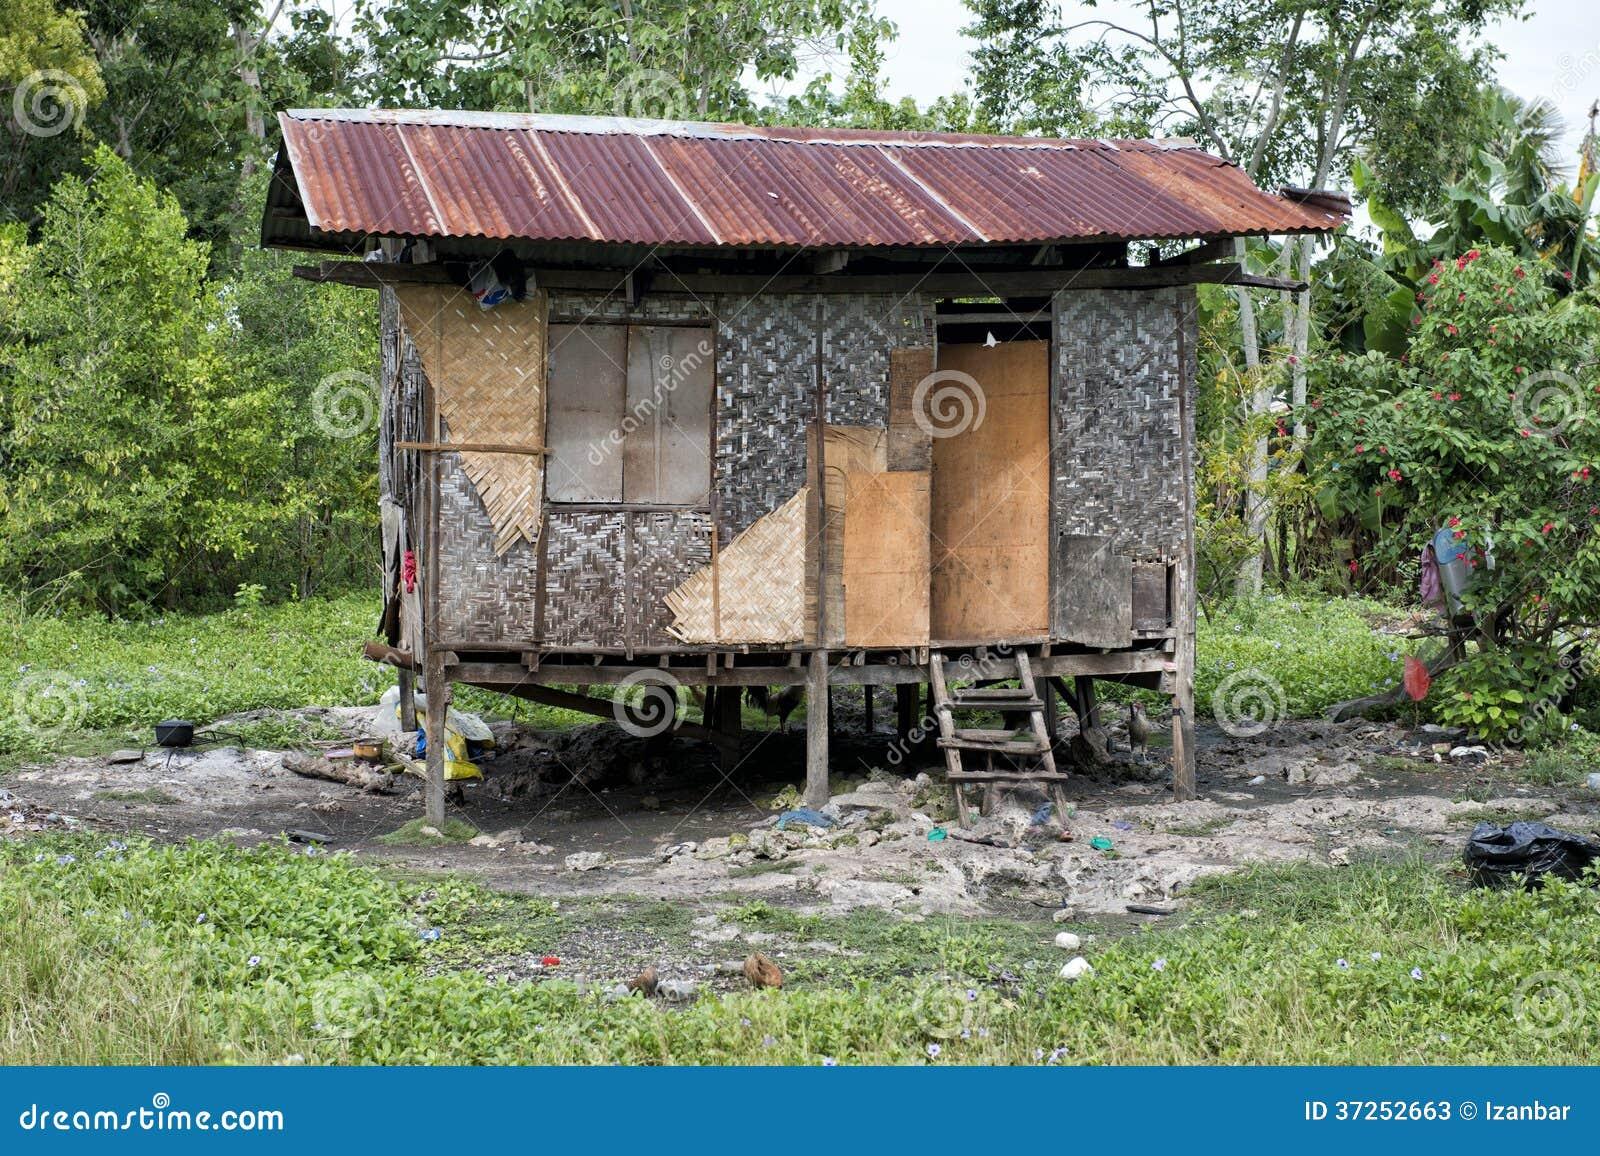 Hovel Shanty Shack In Philippines Stock Photos Image